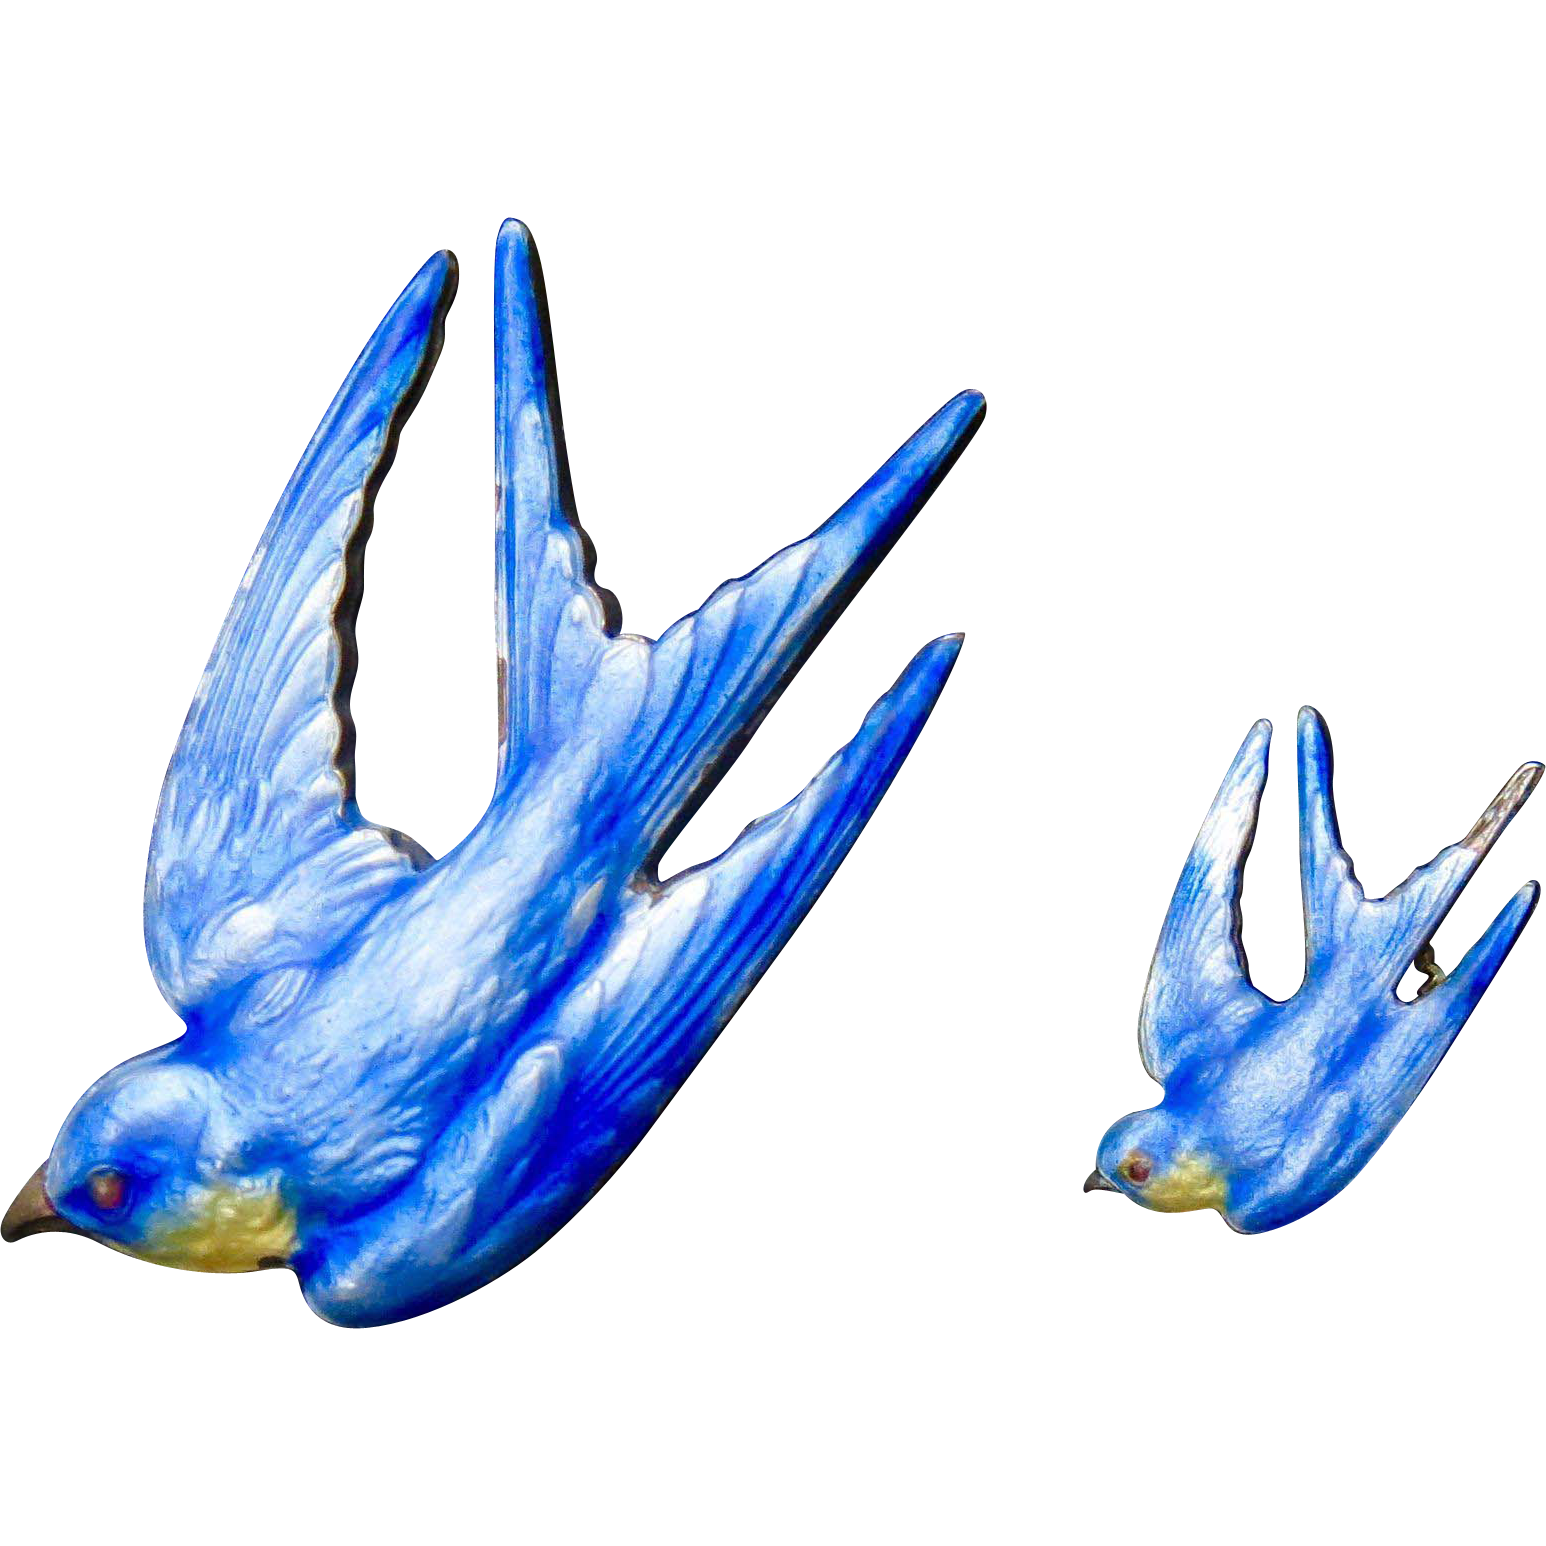 Rare Antique Paye & Baker Sterling Enamel Blue Bird Pin Set - Fully Hallmarked